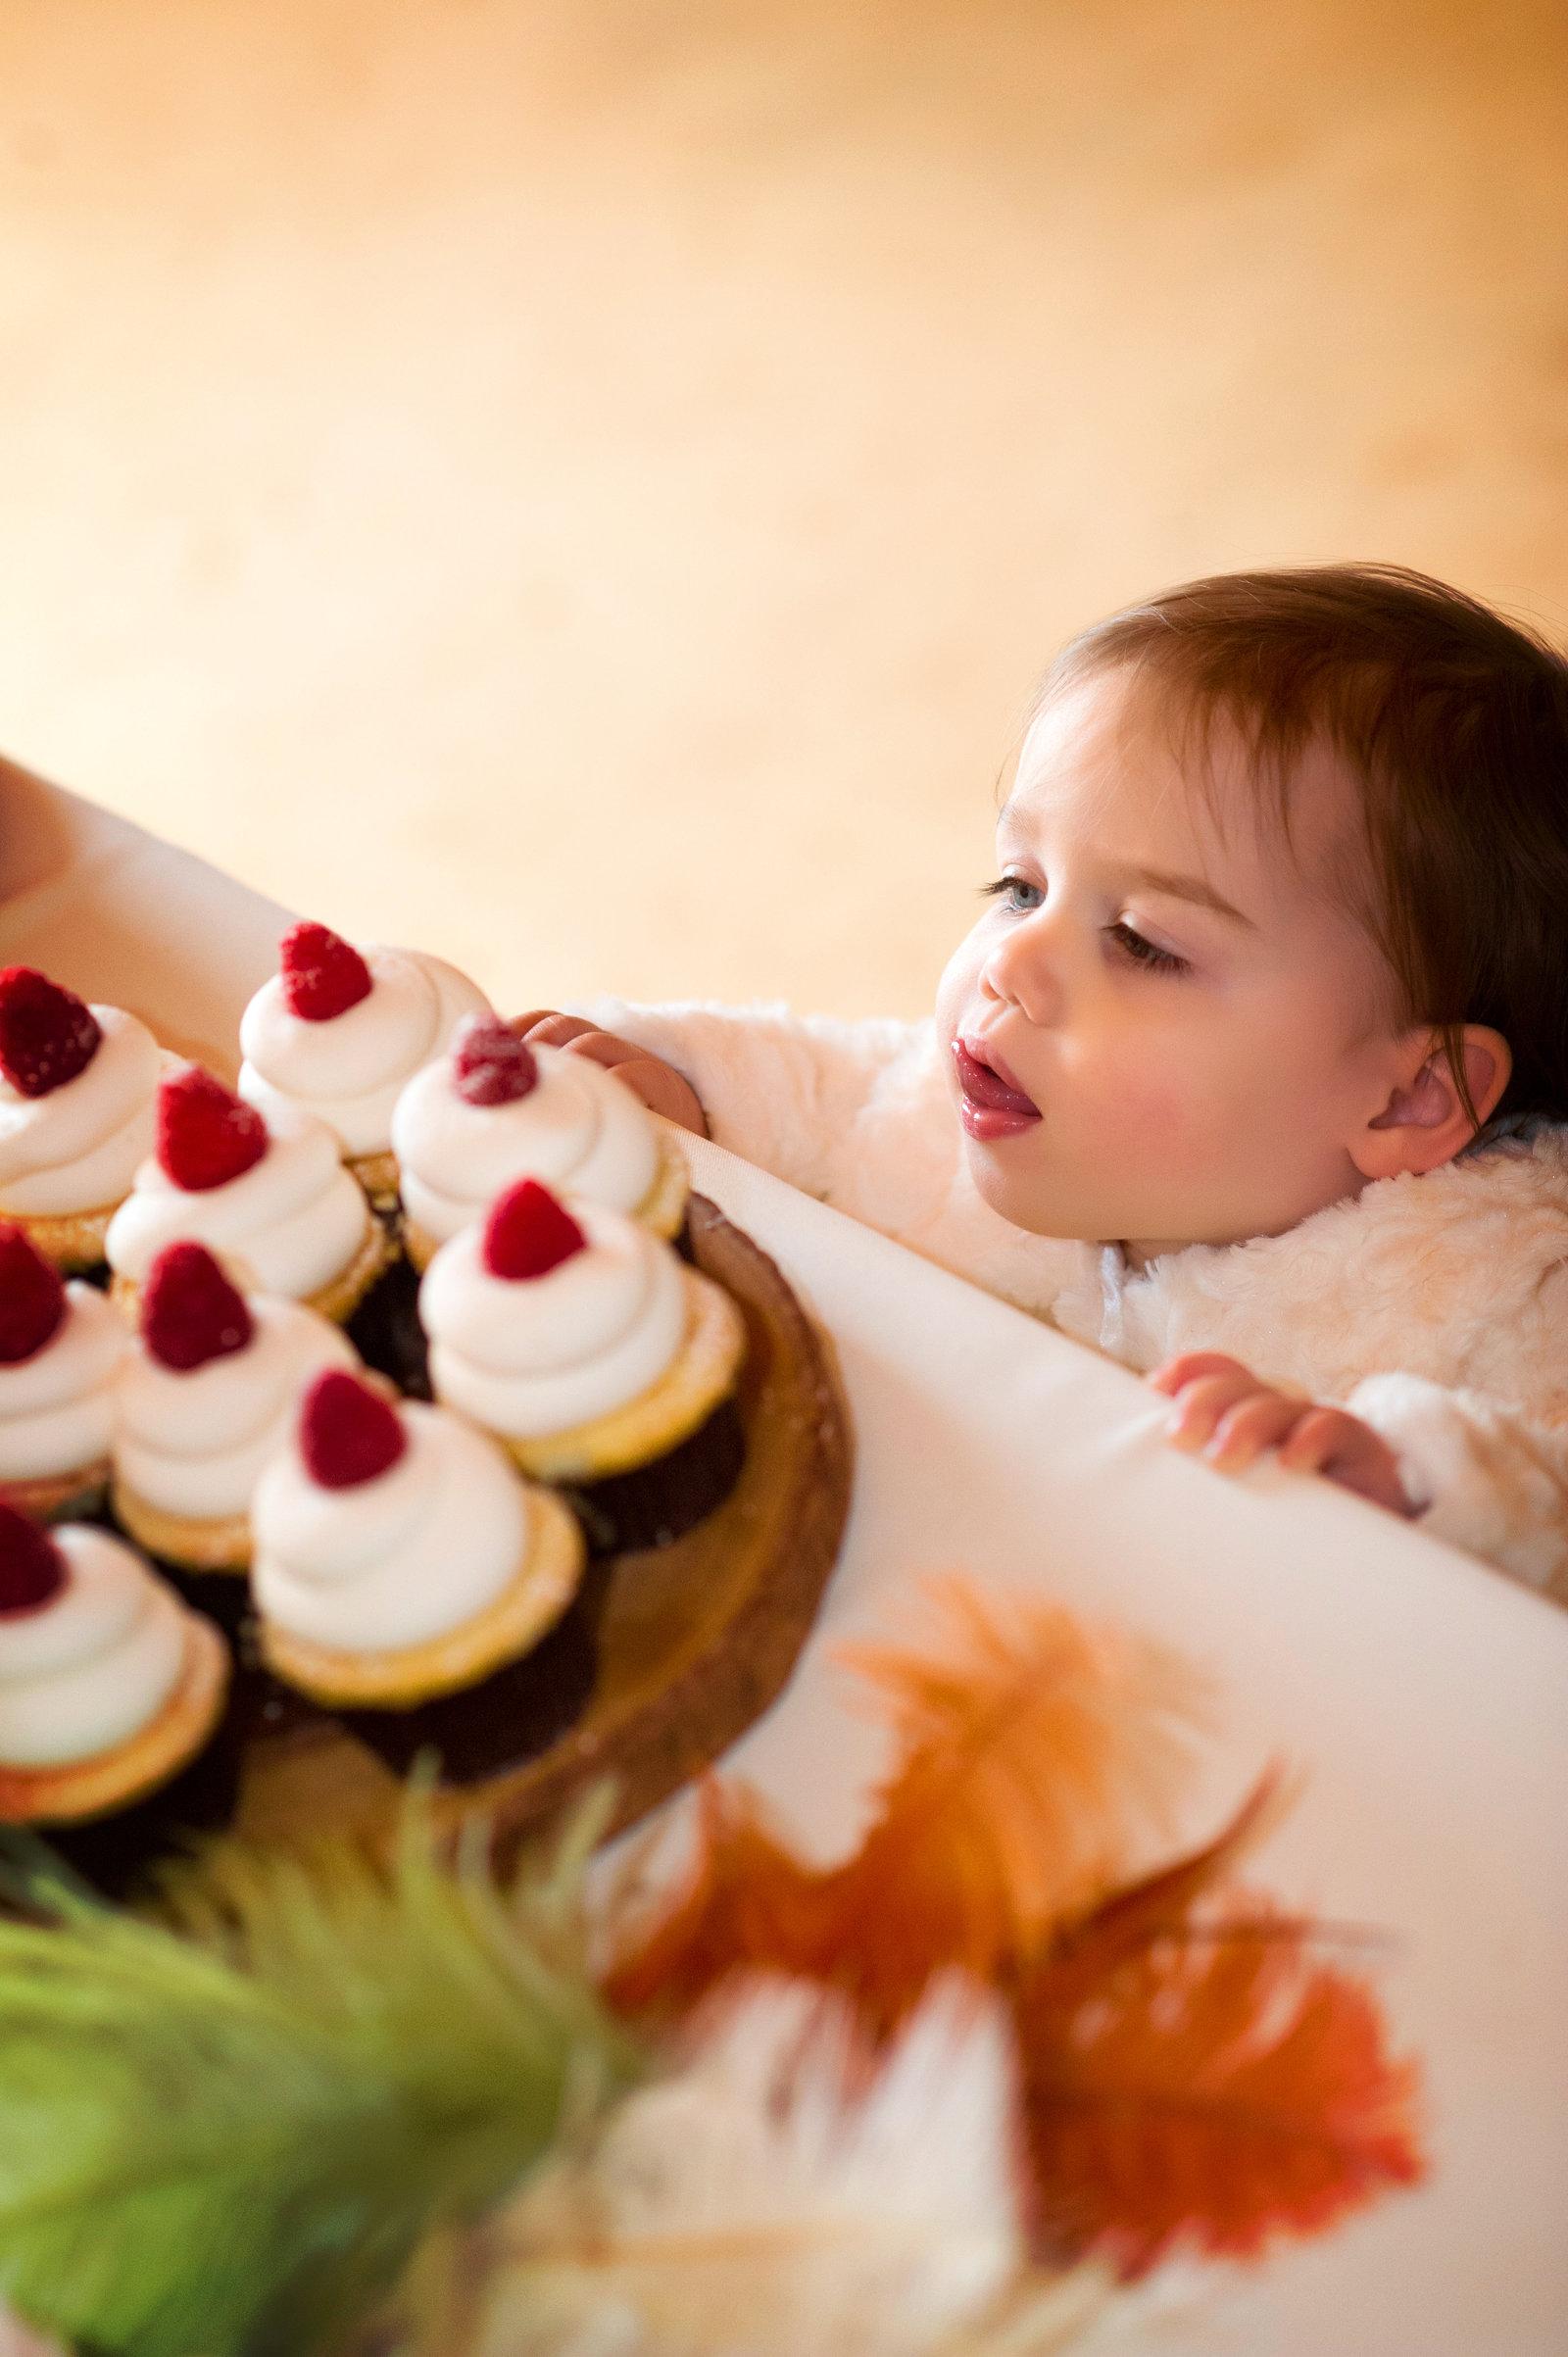 cake and kids